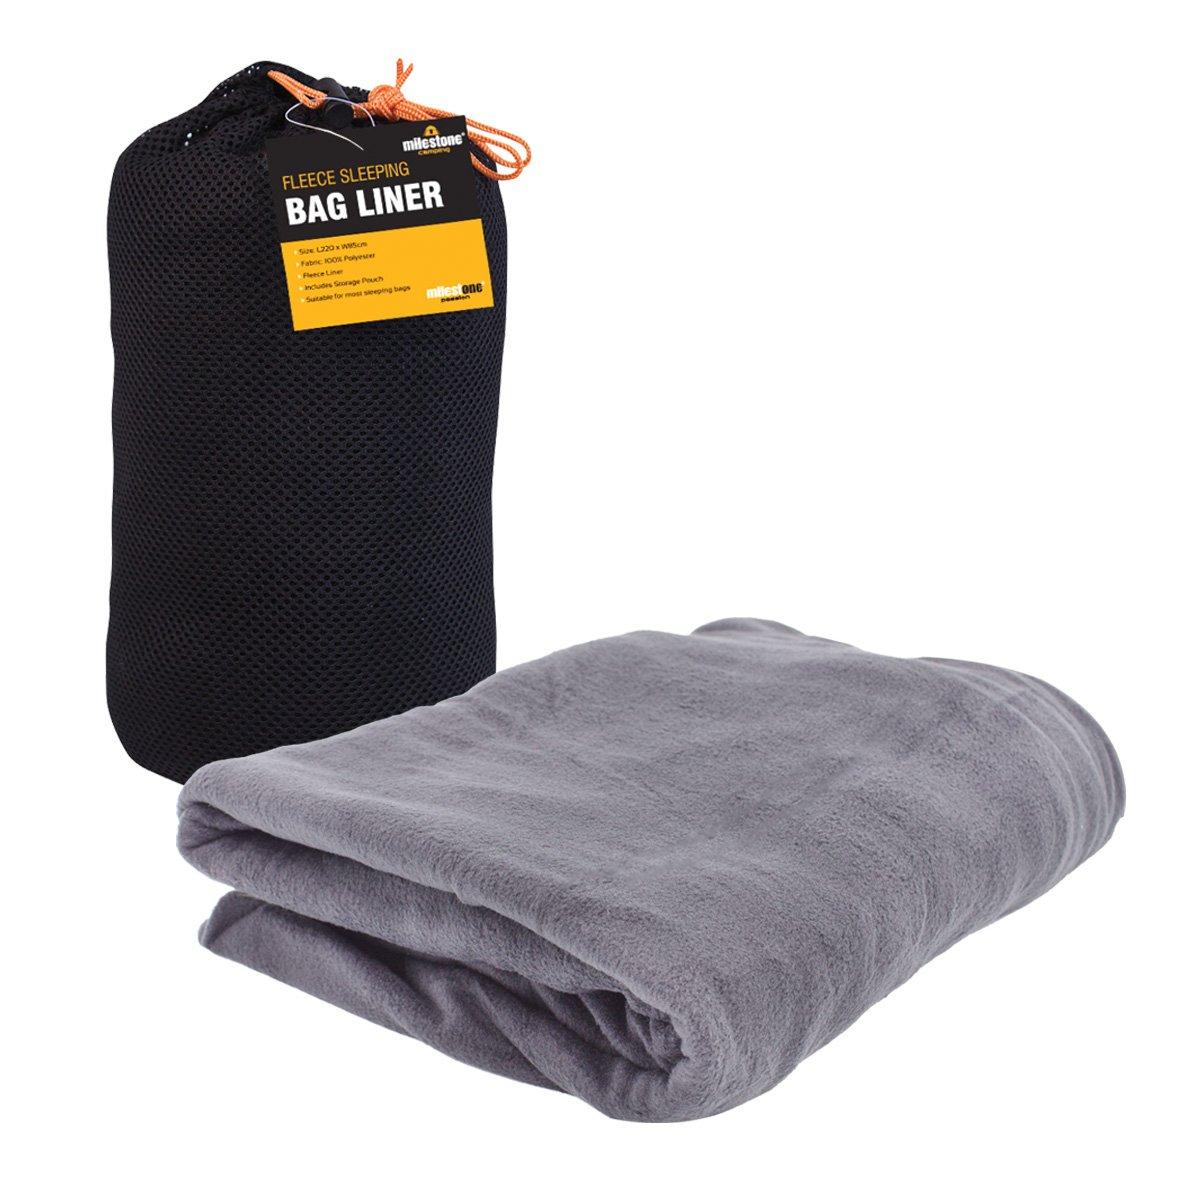 Milestone Camping Fleece Sleeping Bag Liner - Black unknown